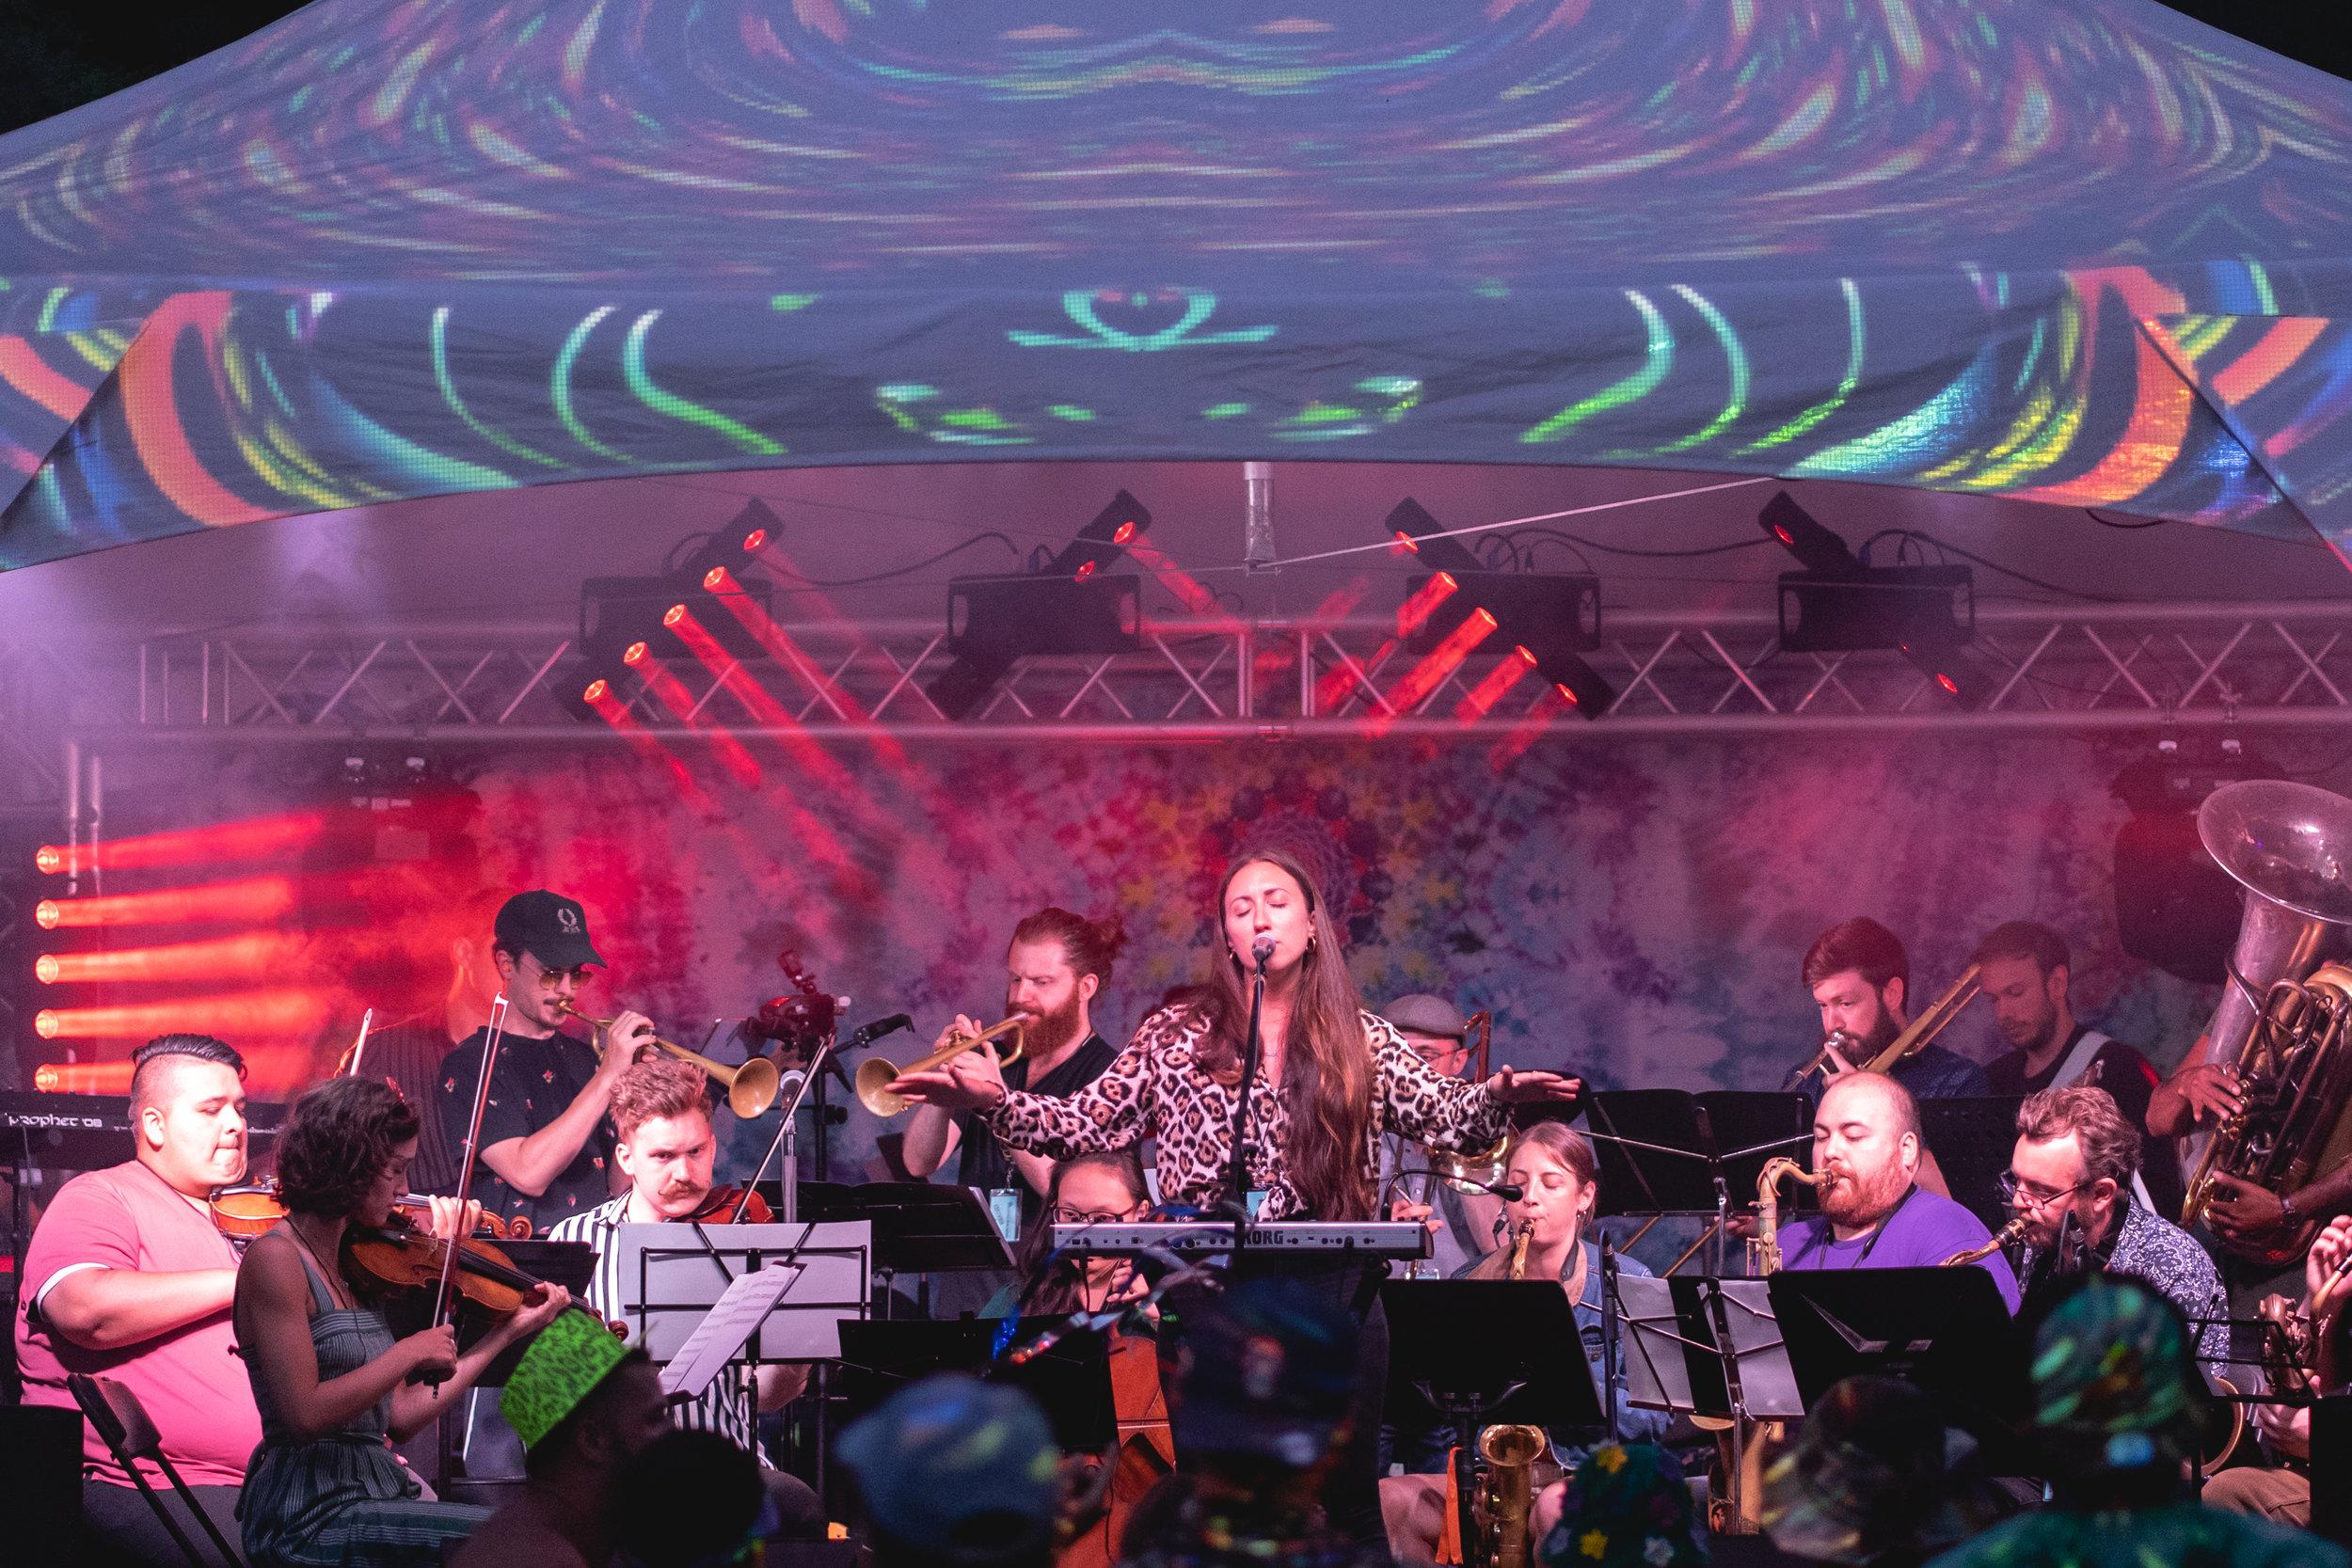 New York Chillharmonic @ Mazzstock 2019 -- Bryan Edward Creative Festival Photography 2019-29.jpg